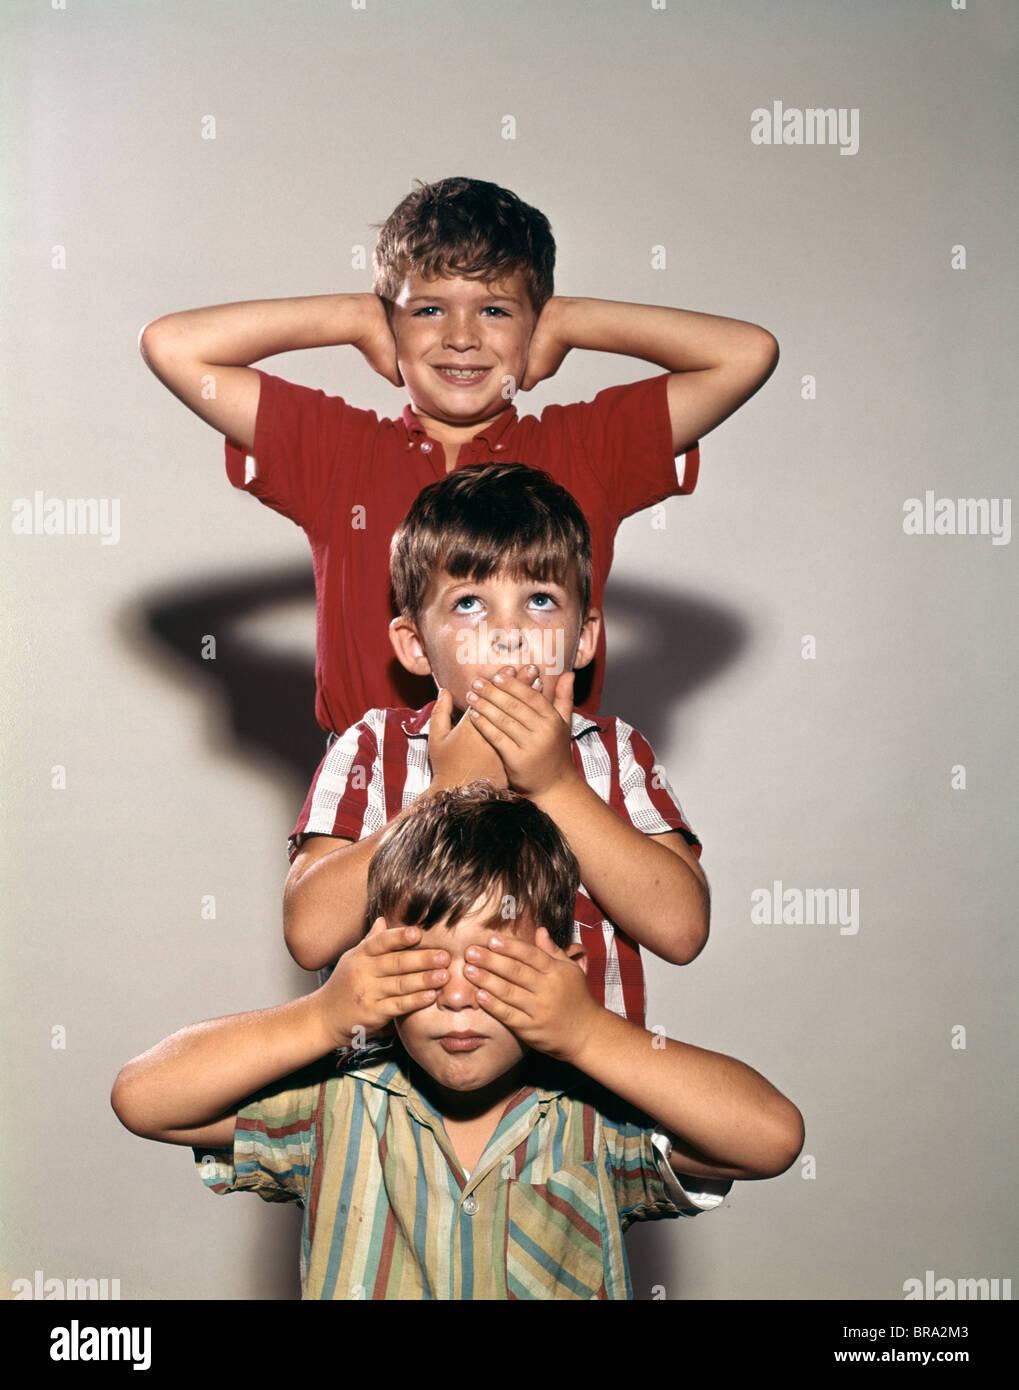 1960s BOYS POSING AS THREE WISE MONKEYS SEE NO EVIL HEAR NO EVIL SPEAK NO EVIL SYMBOLIC STORY - Stock Image